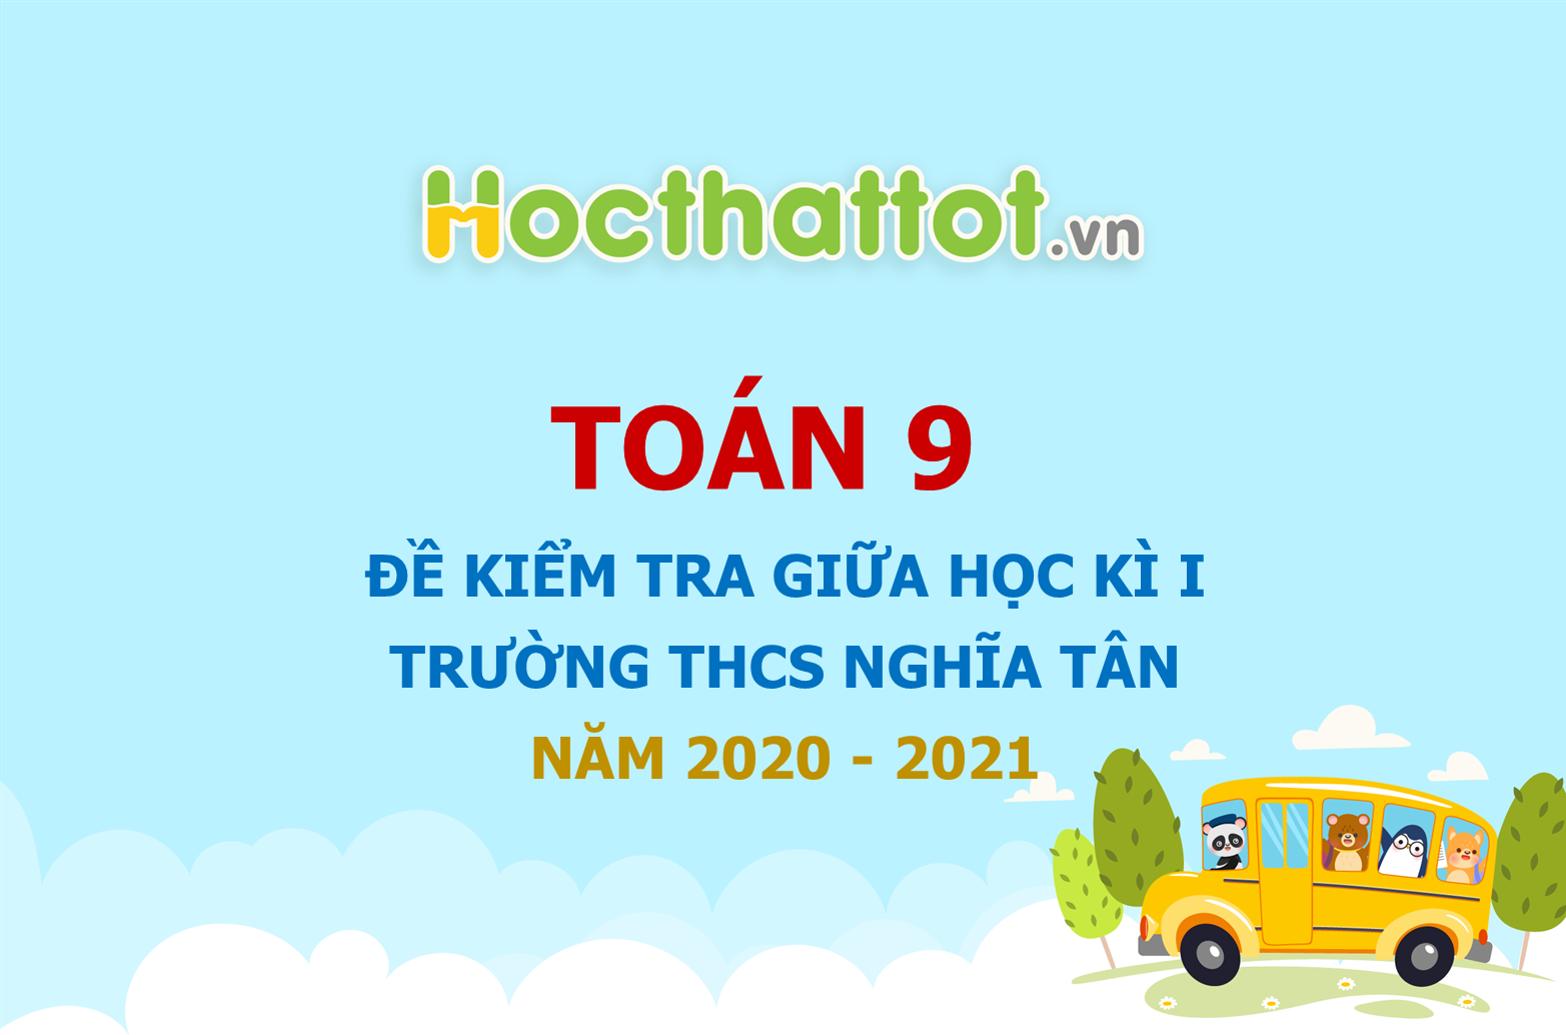 de-kiem-tra-giua-hoc-ki-1-lop9-truong-THCS-Nghia-Tan-nam-2020.jpg